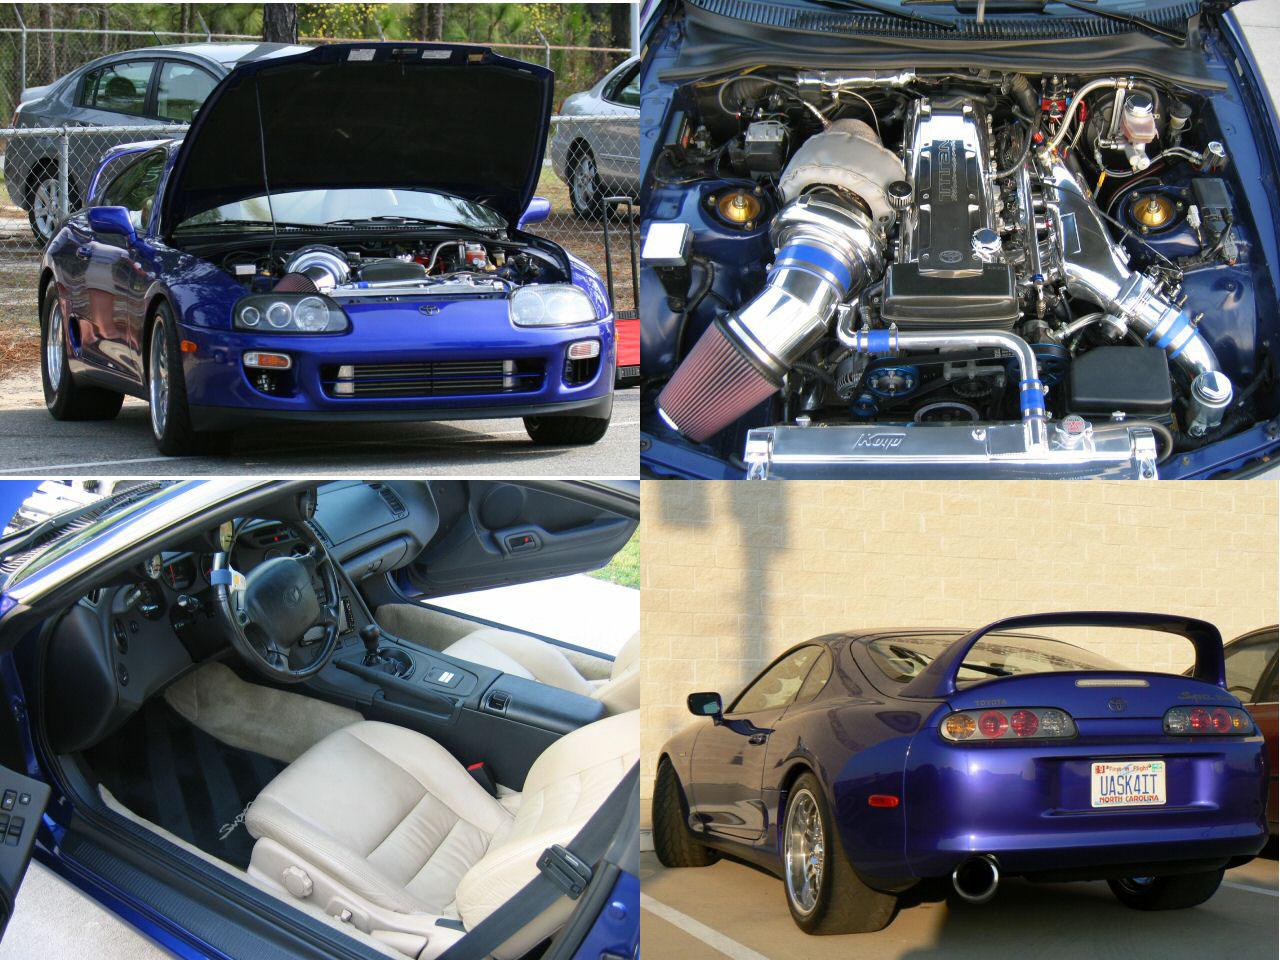 1997 Toyota Supra Turbo Pictures, Mods, Upgrades, Wallpaper